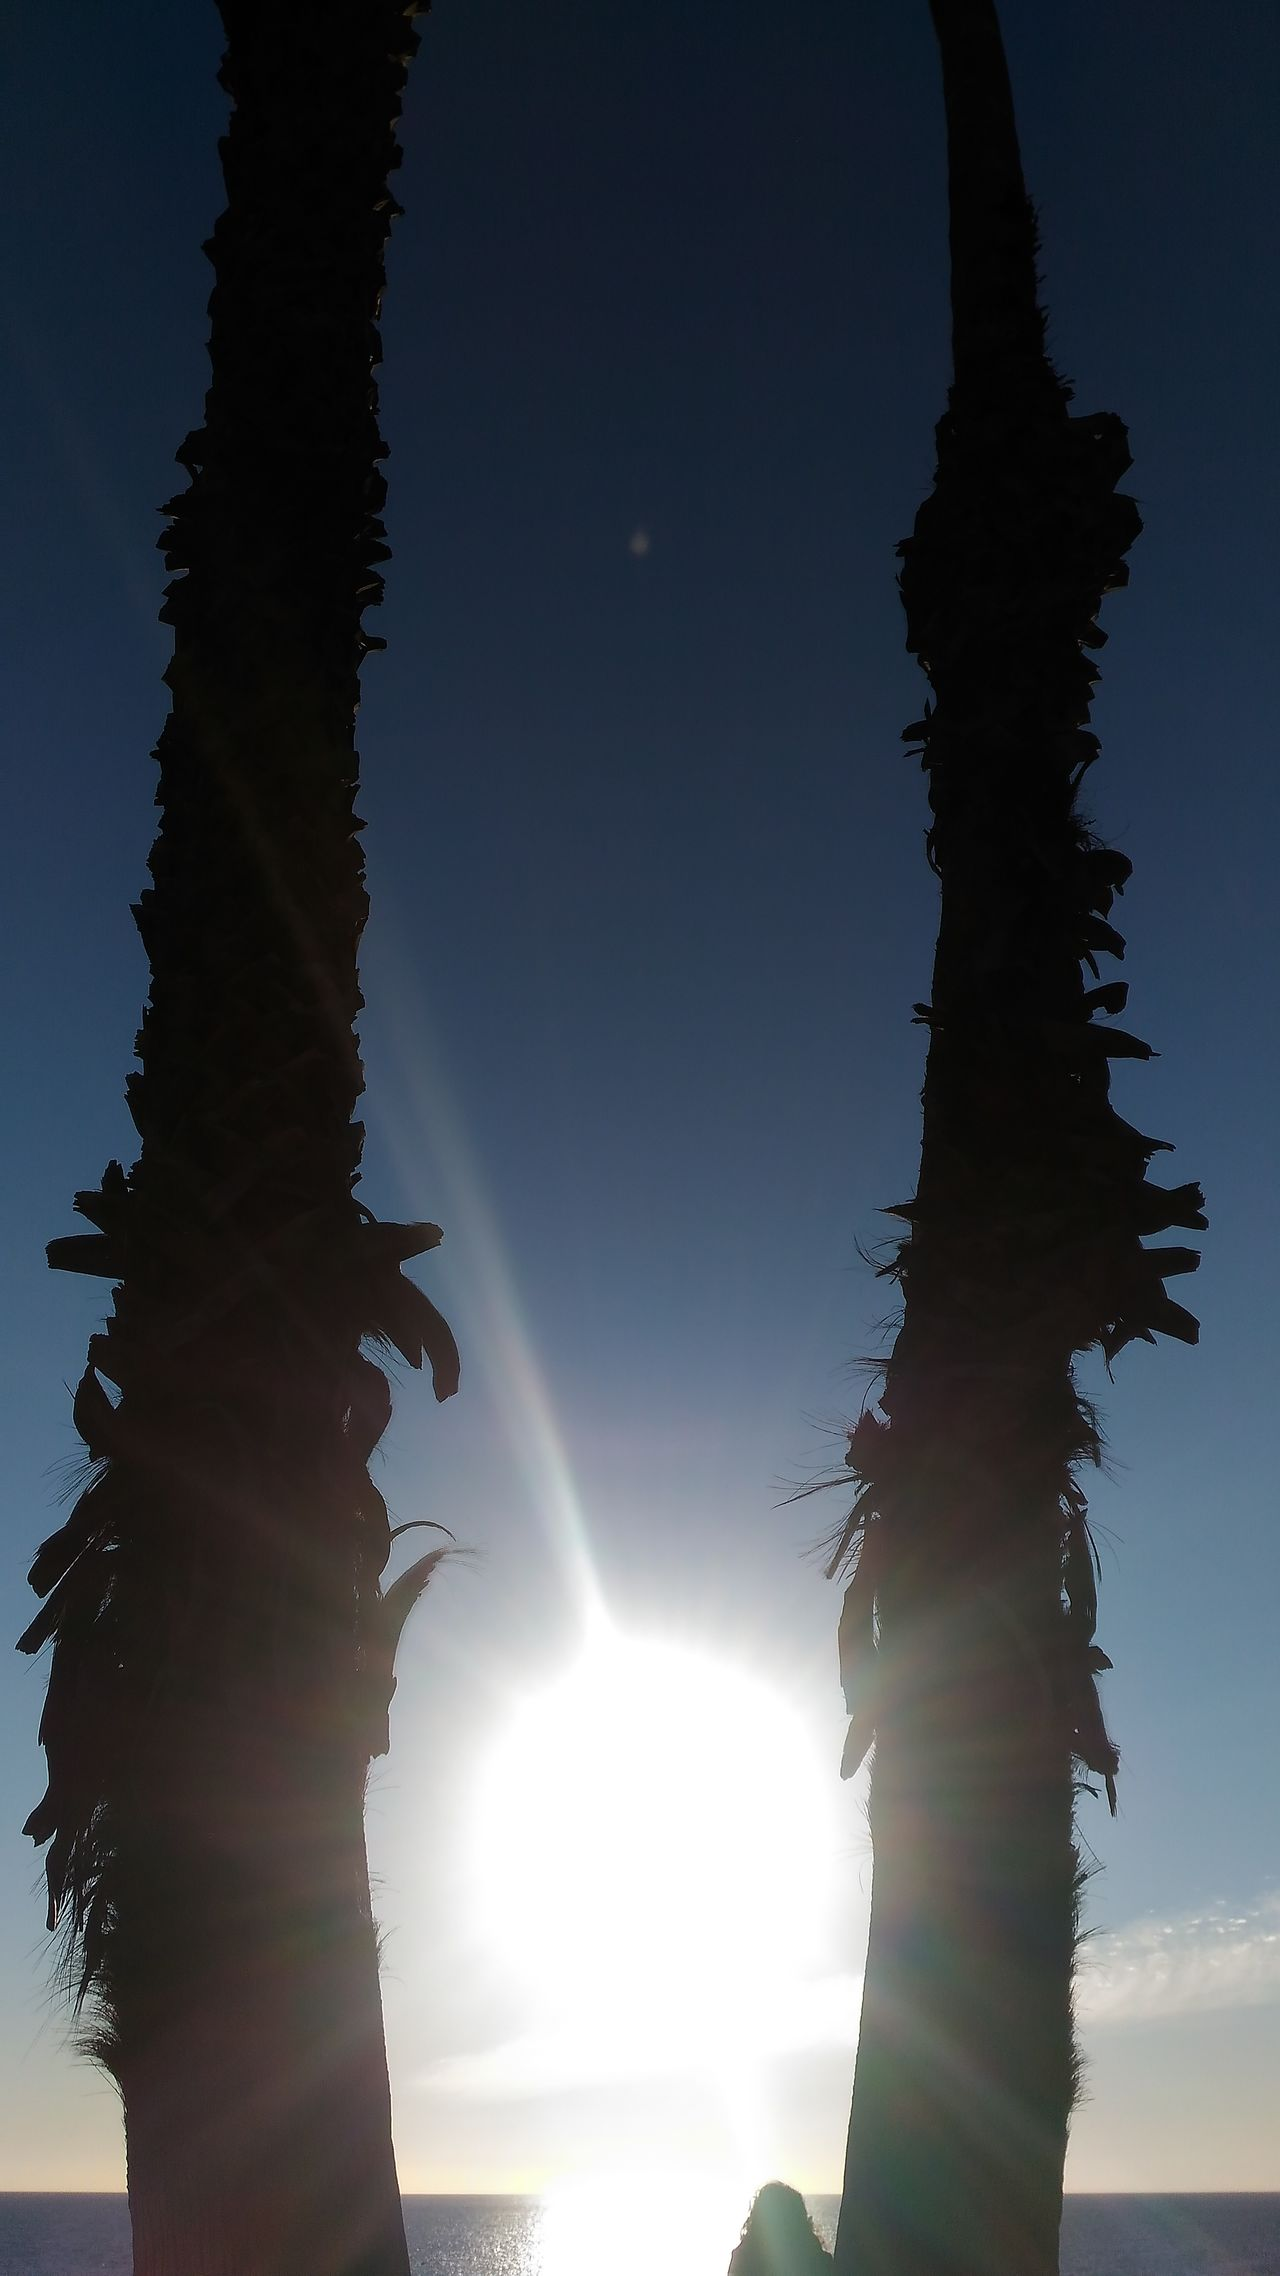 Sunset Lovers Sunset✨trees✨ Enjoying The Sunset EyeEm Best Shots - Sunsets + Sunrise Sunsetphotographs Beautiful Sunset Sunsetlover Sunset_collection Sunset Sunsets Sunset Silhouettes Sunsetporn Beachphotography Beach Beach Life Beachlovers Santa Monica